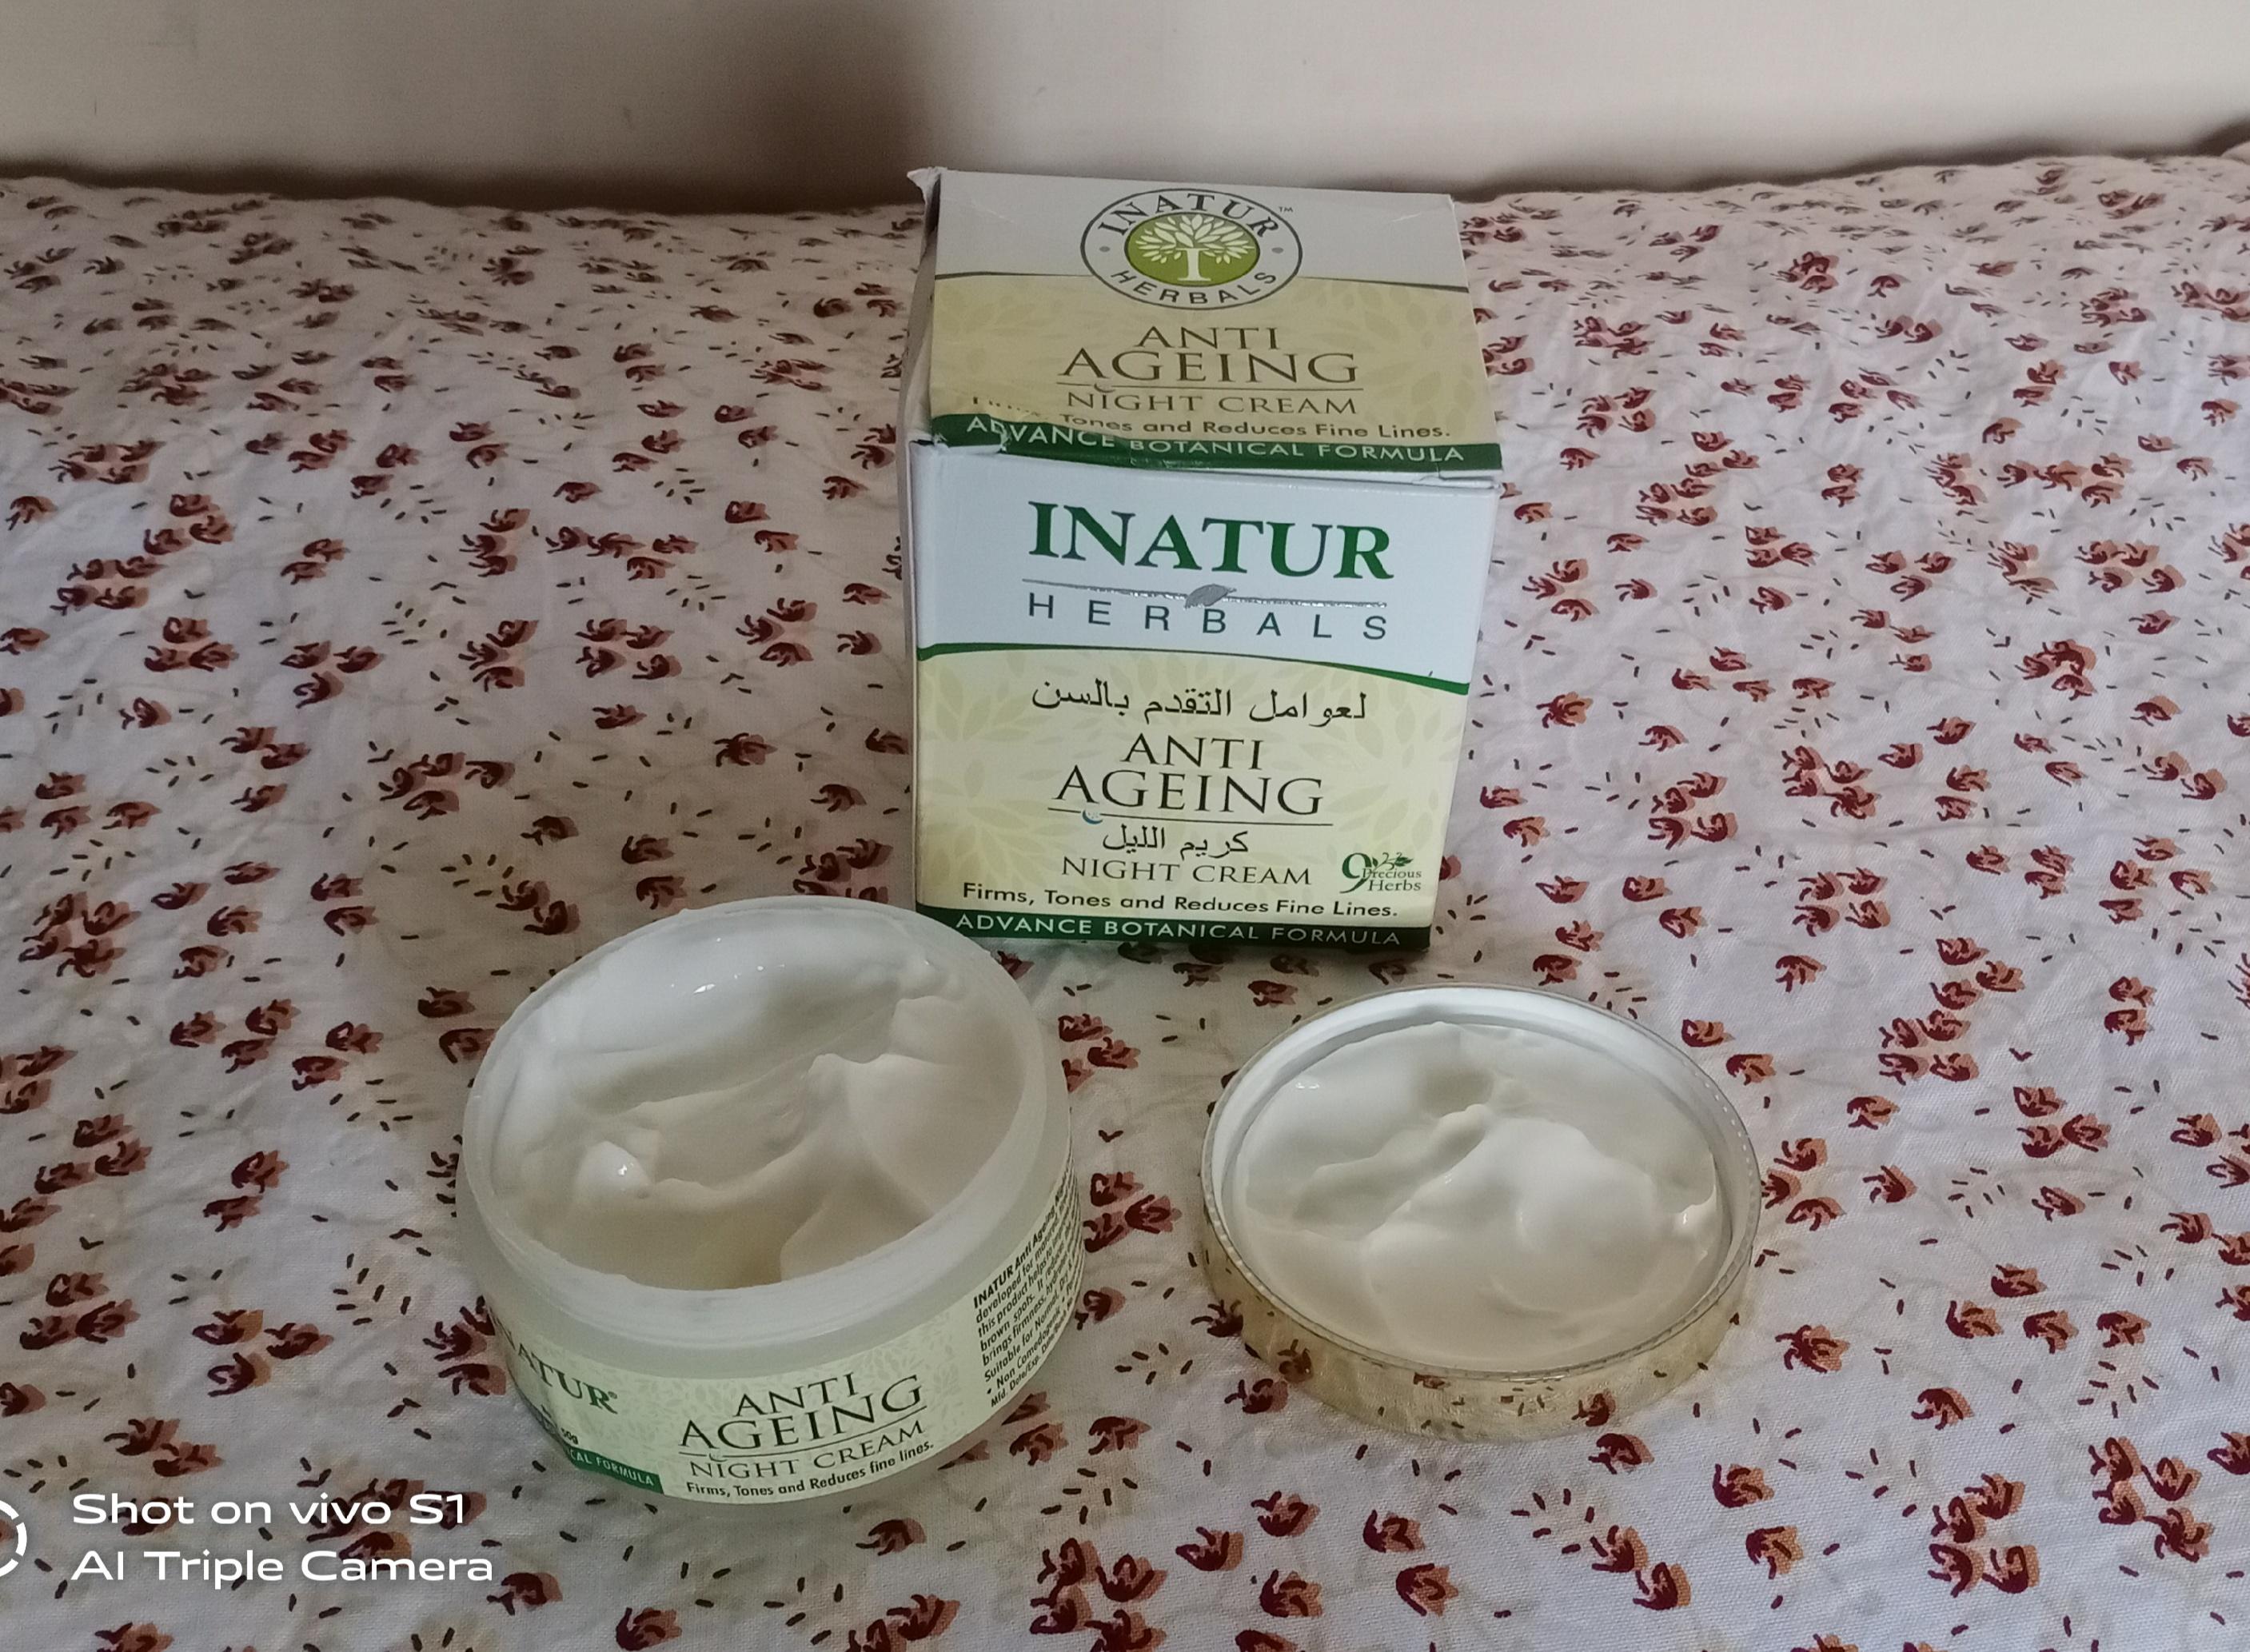 Inatur Anti-Ageing Night Cream pic 2-NYC blend of natural herbs-By aprajita_trivedi